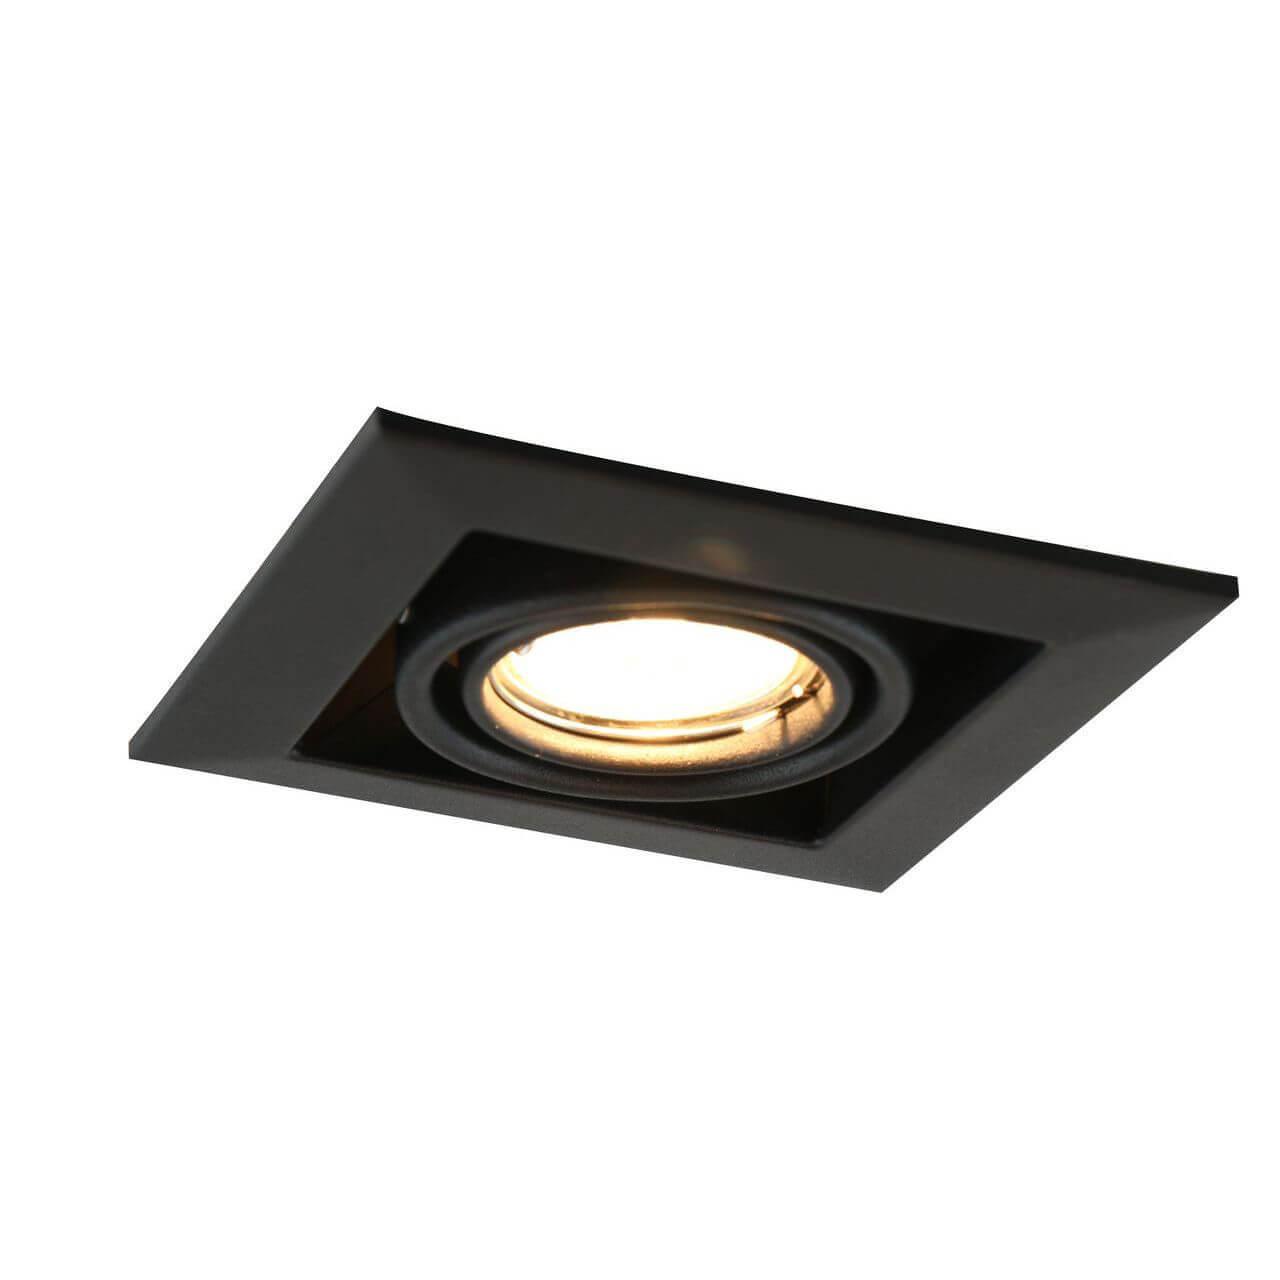 Светильник Arte Lamp A5941PL-1BK Cardani Piccolo BK цена 2017